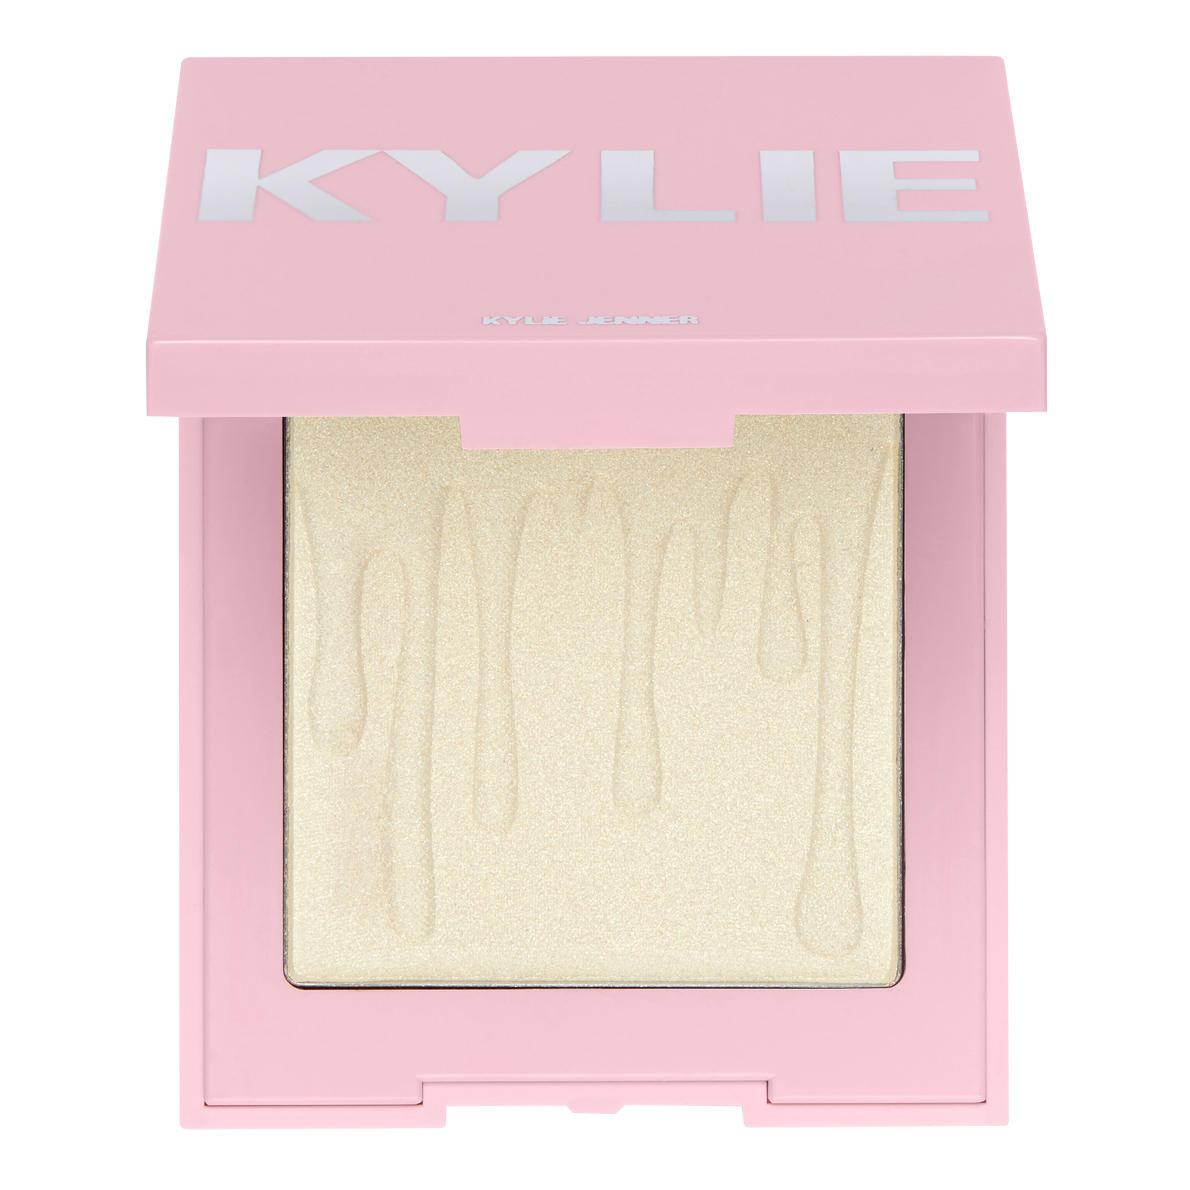 Kylie Cosmetics Kylighter Quartz